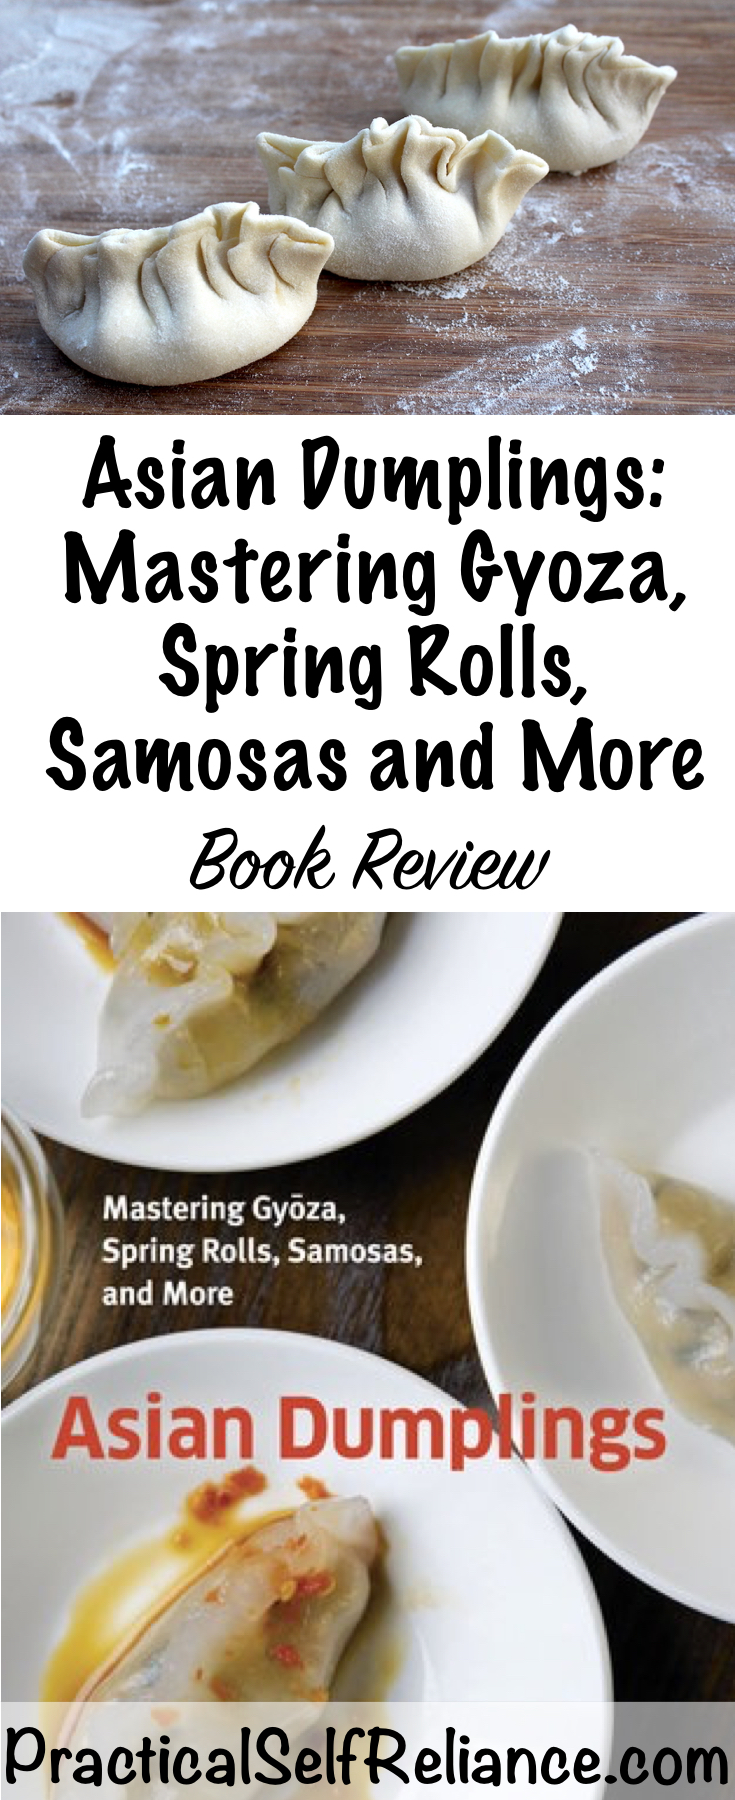 Asian Dumplings: Mastering Gyoza, Spring Rolls, Samosas and More - Book Review and Recipe